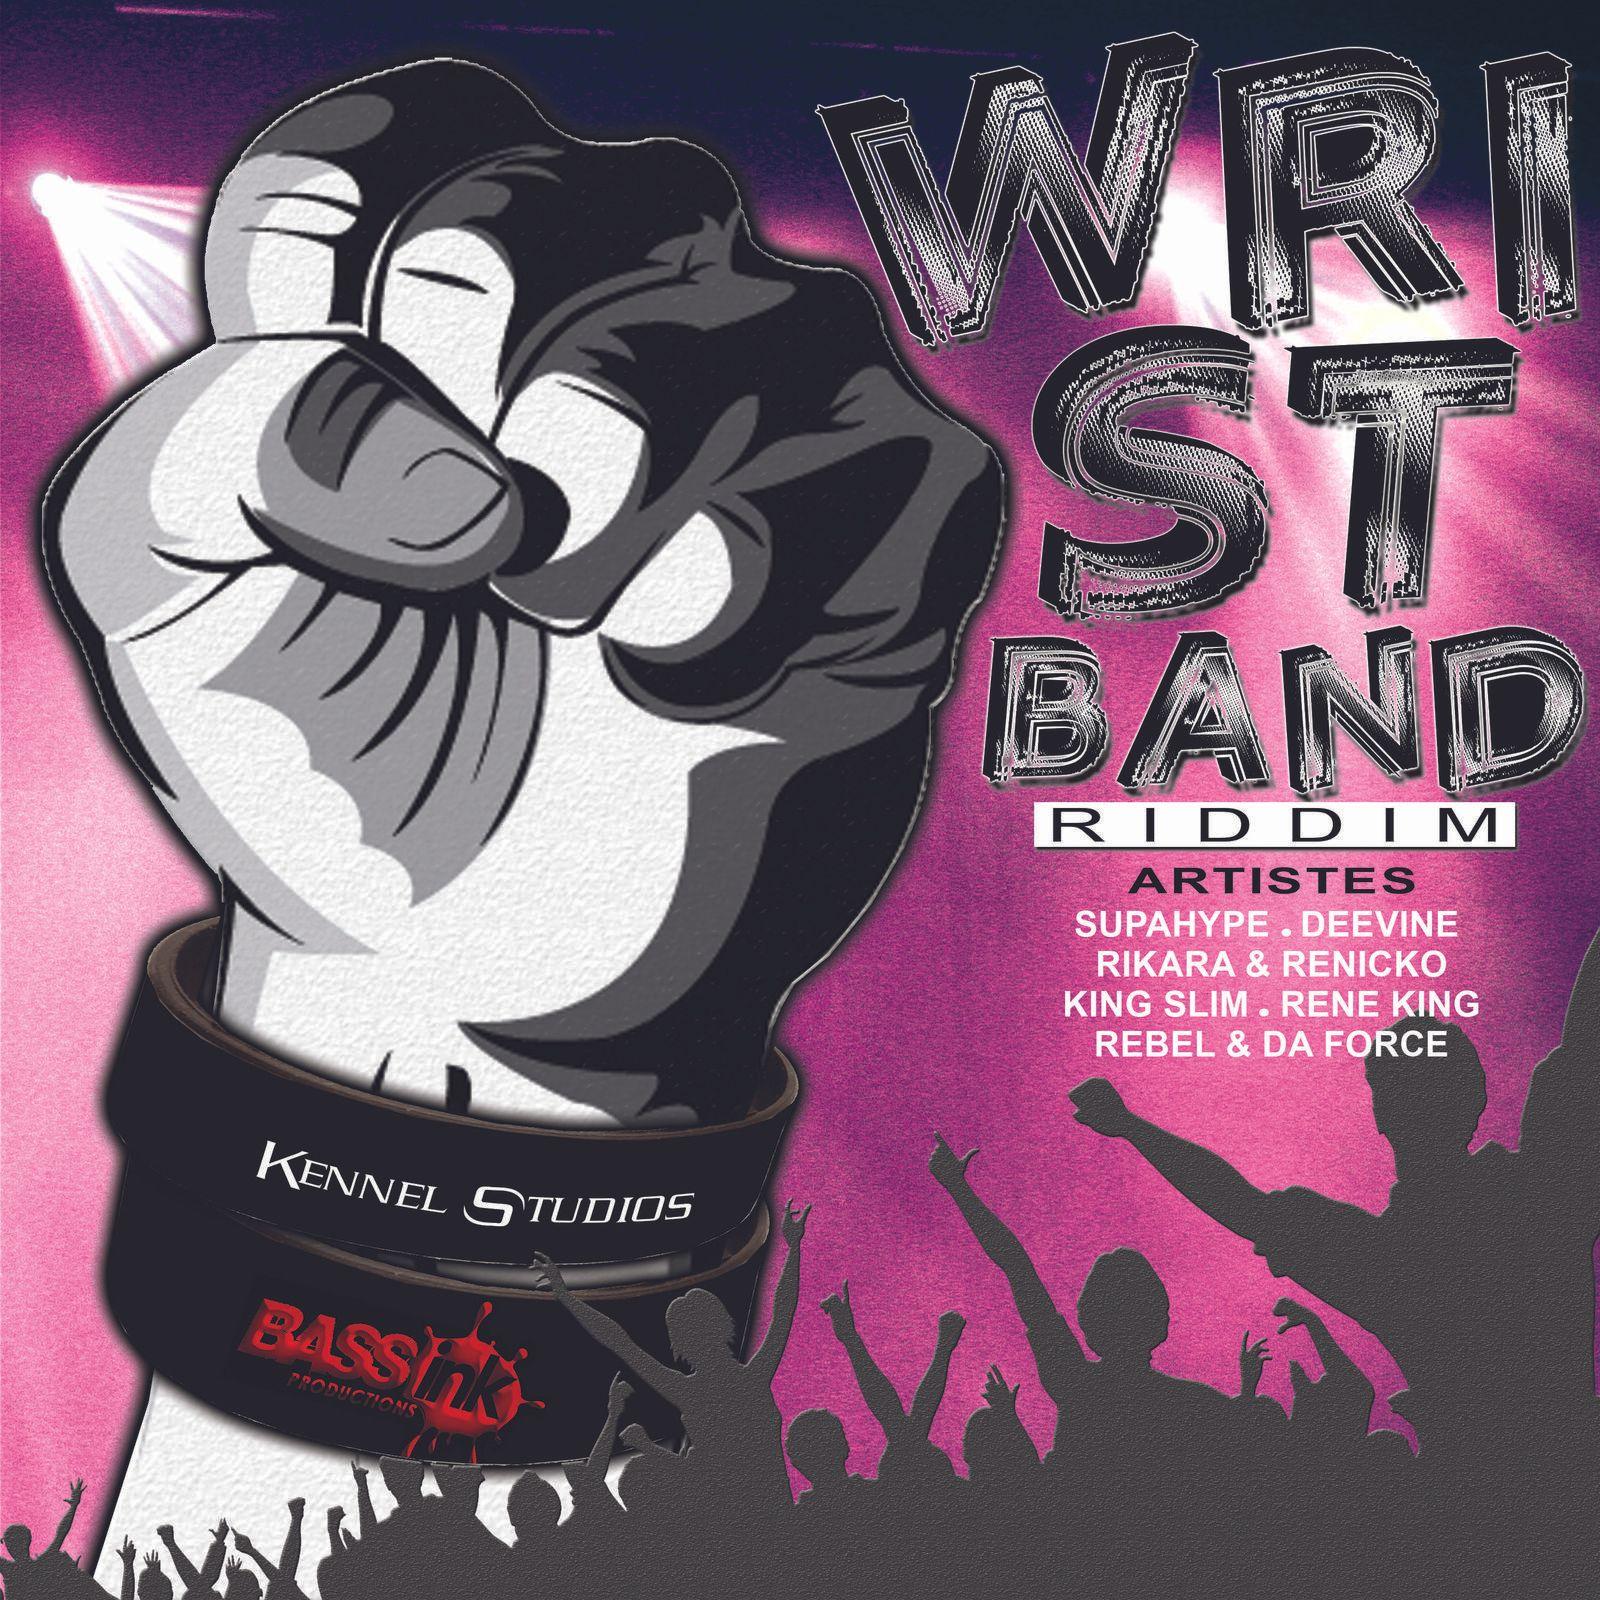 Executive Privilege Audiobook: Wristband Riddim By Various Artist, From DancehallSoca